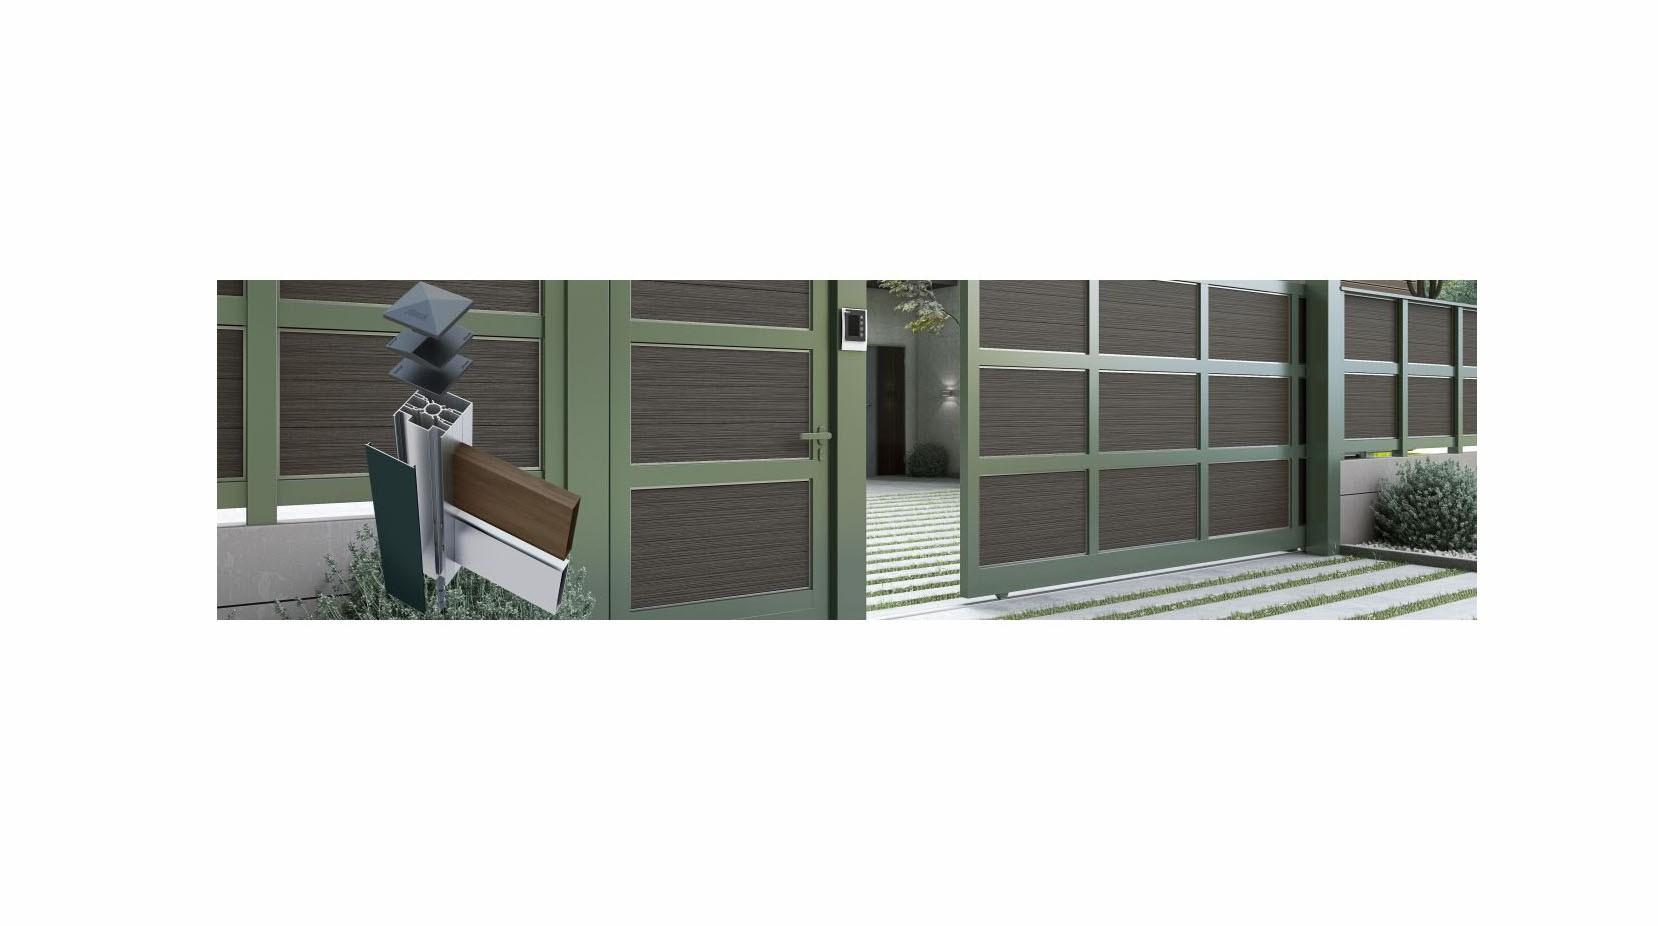 fc80-slide2d5eb8b6-f205-42ad-bd5e-86e0173c4a7e